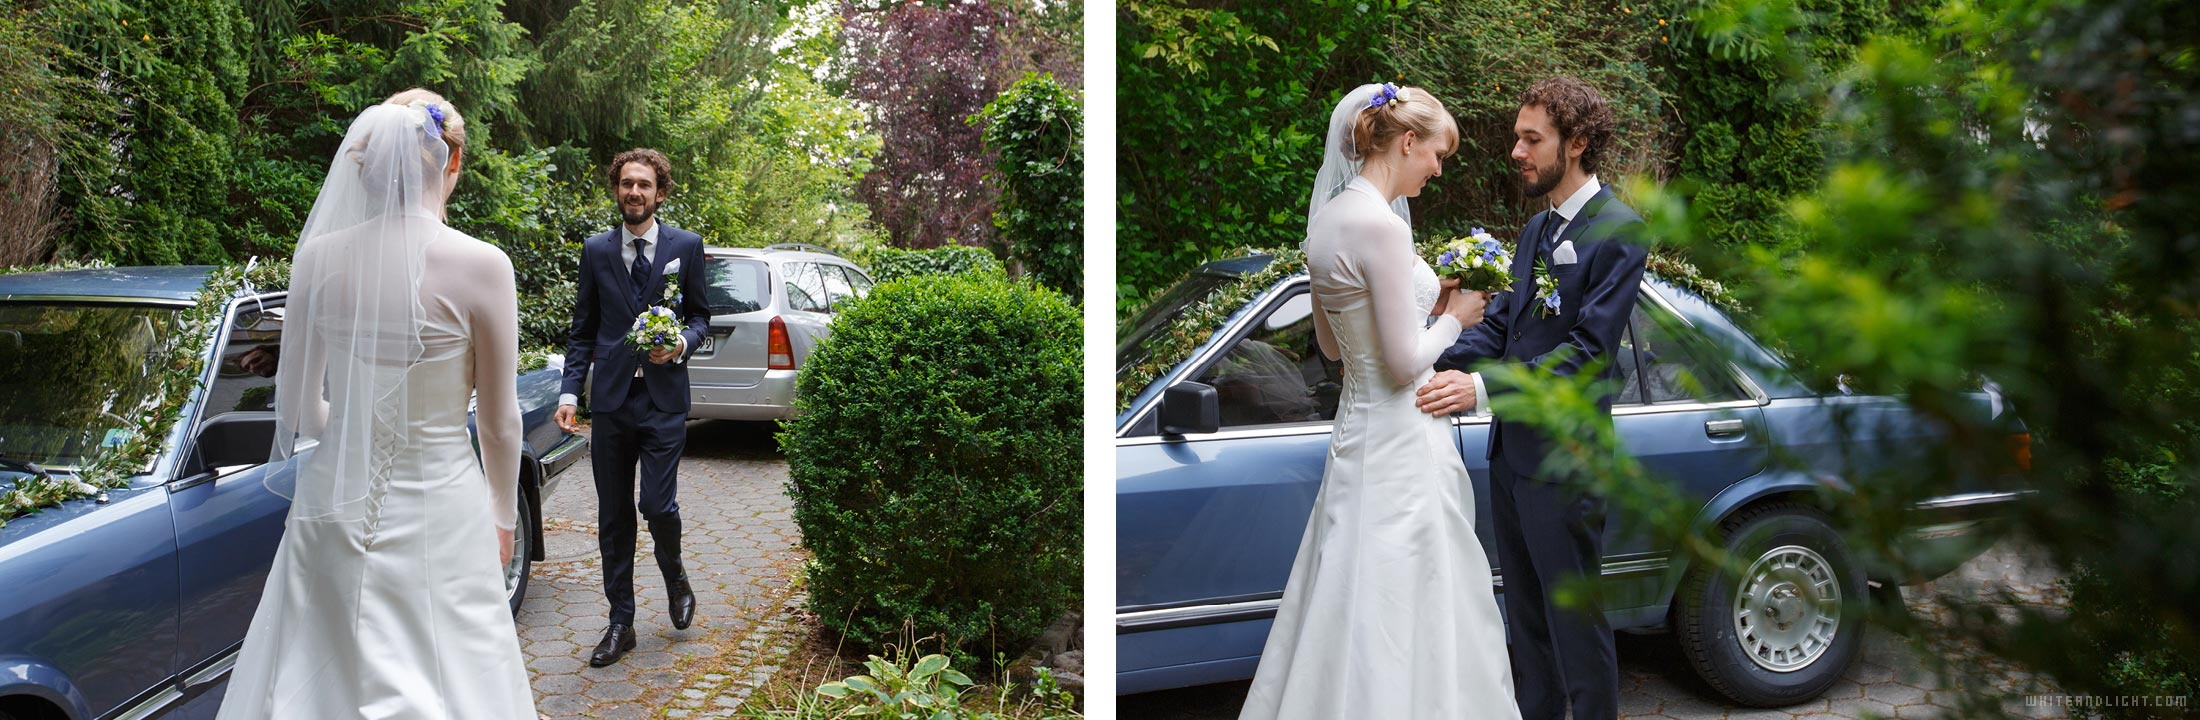 bavaria downs wedding venue